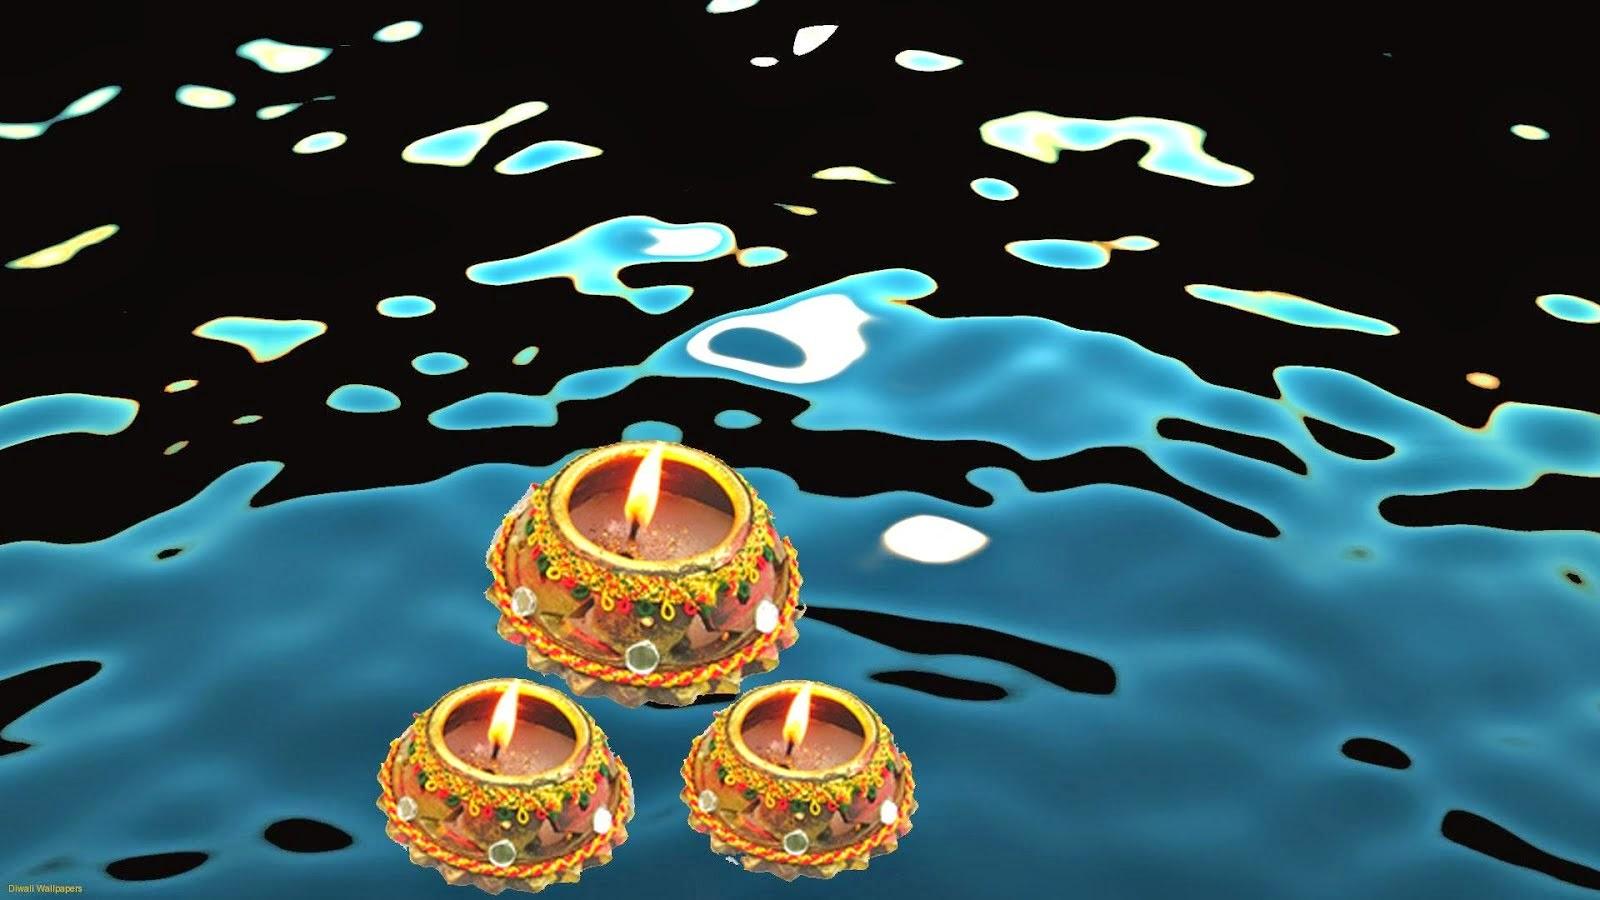 Krishna 3d Wallpaper For Mobile Happy Diwali 2014 Wishes